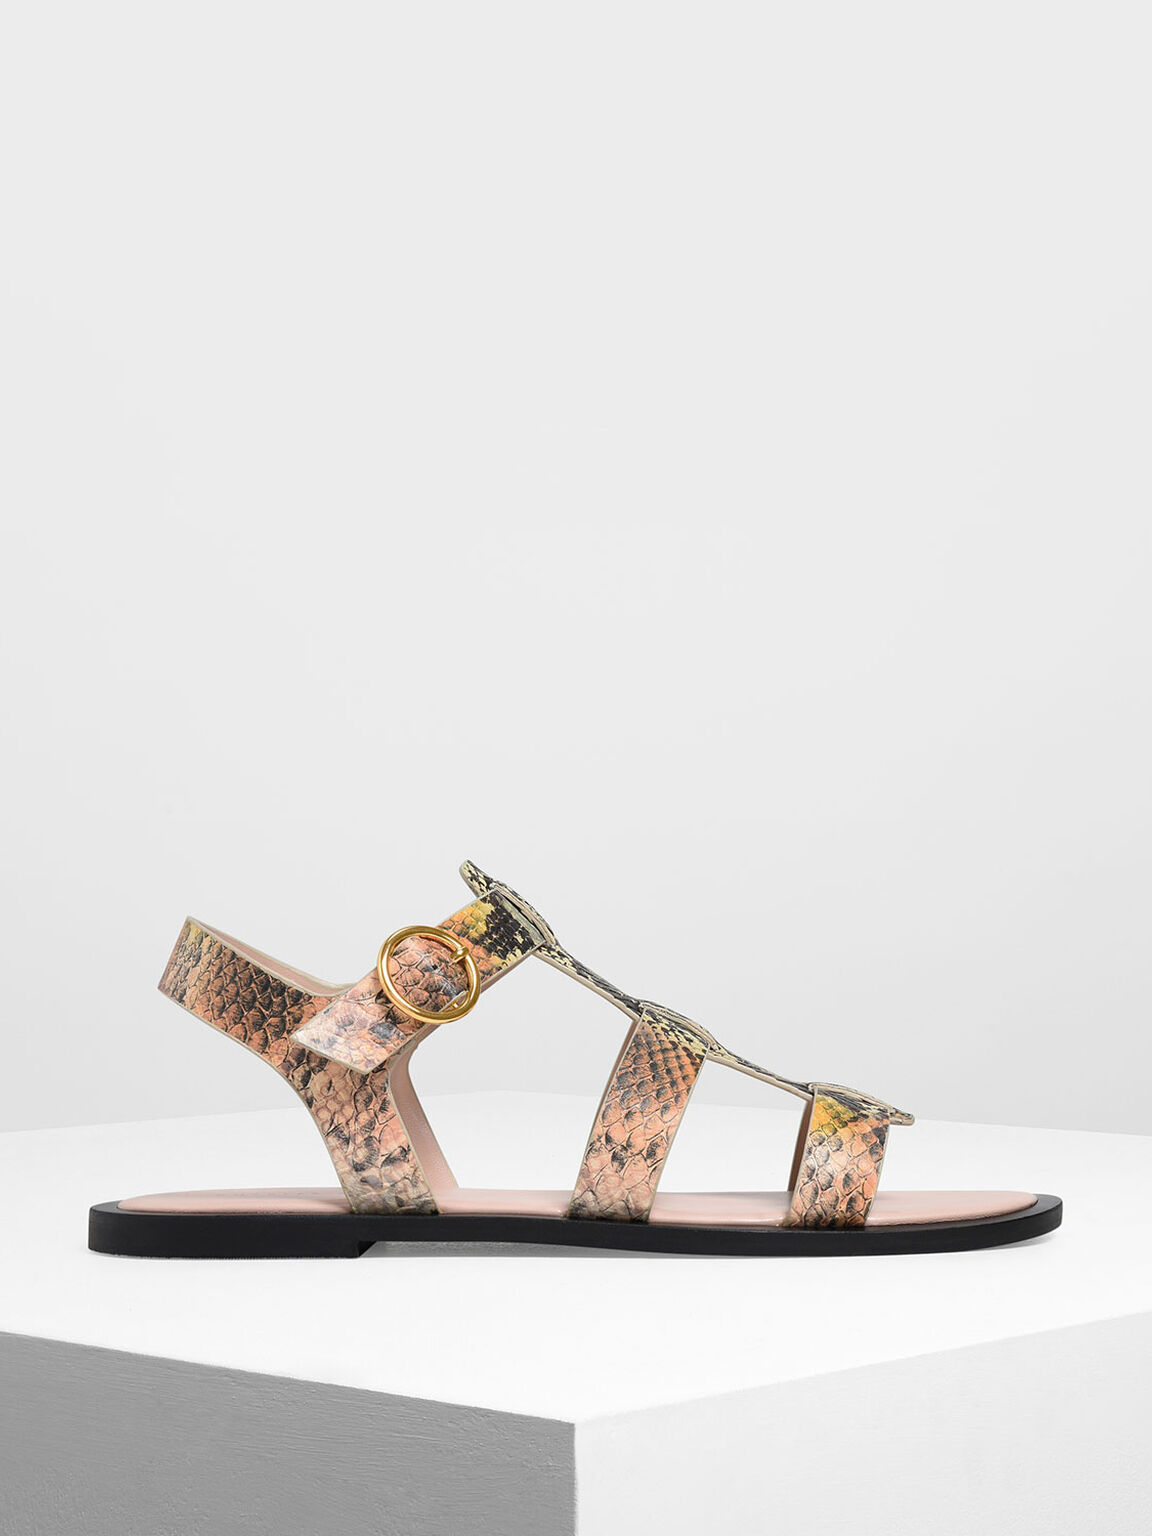 蛇紋寬帶平底涼鞋, 混色, hi-res